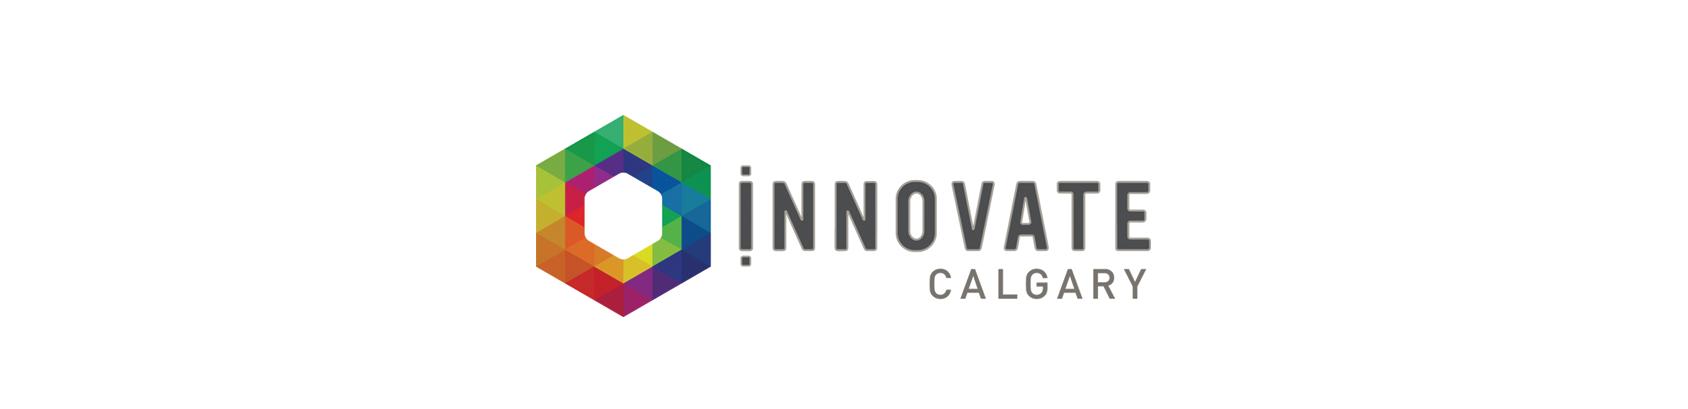 Innovate Calgary horizontal sized.png